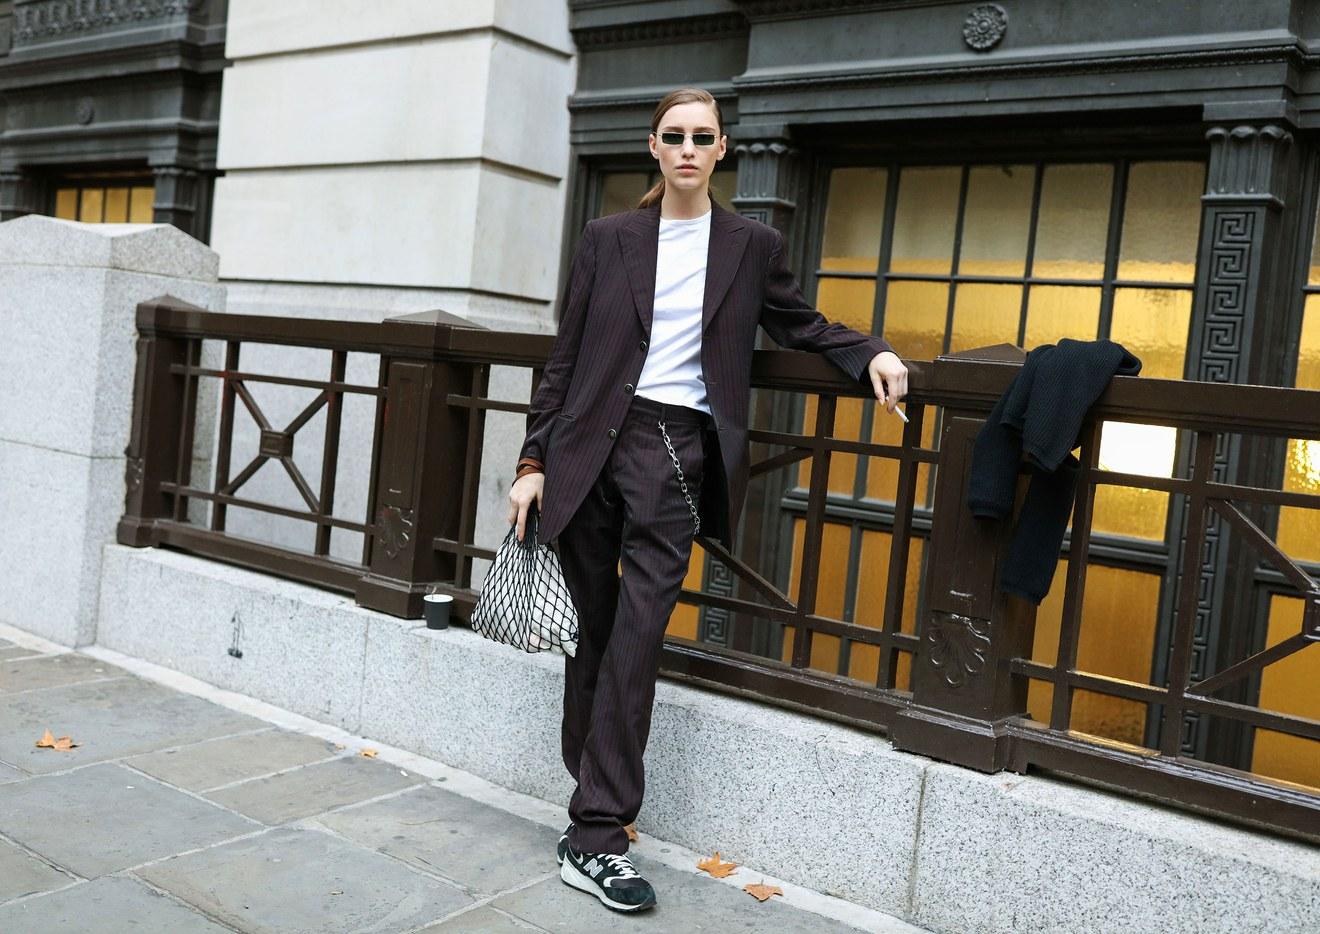 02-net-bag-style-phil-oh-street-style-lfw-ss18.jpg